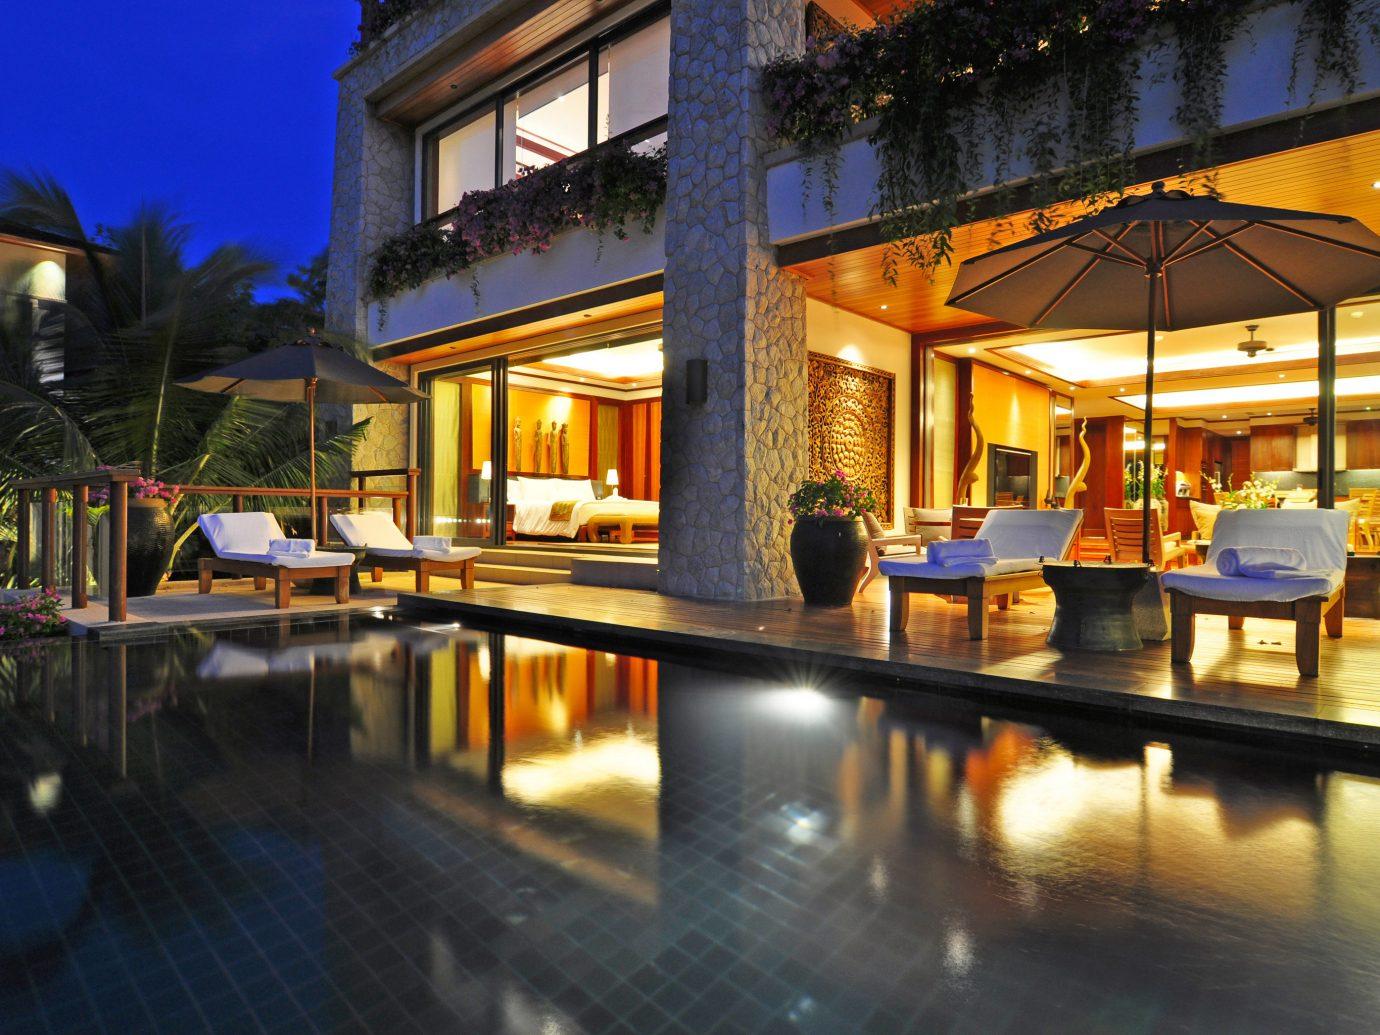 Exterior Hotels Outdoors Patio Pool Suite Terrace Tropical building floor outdoor leisure property Resort swimming pool estate restaurant night Villa